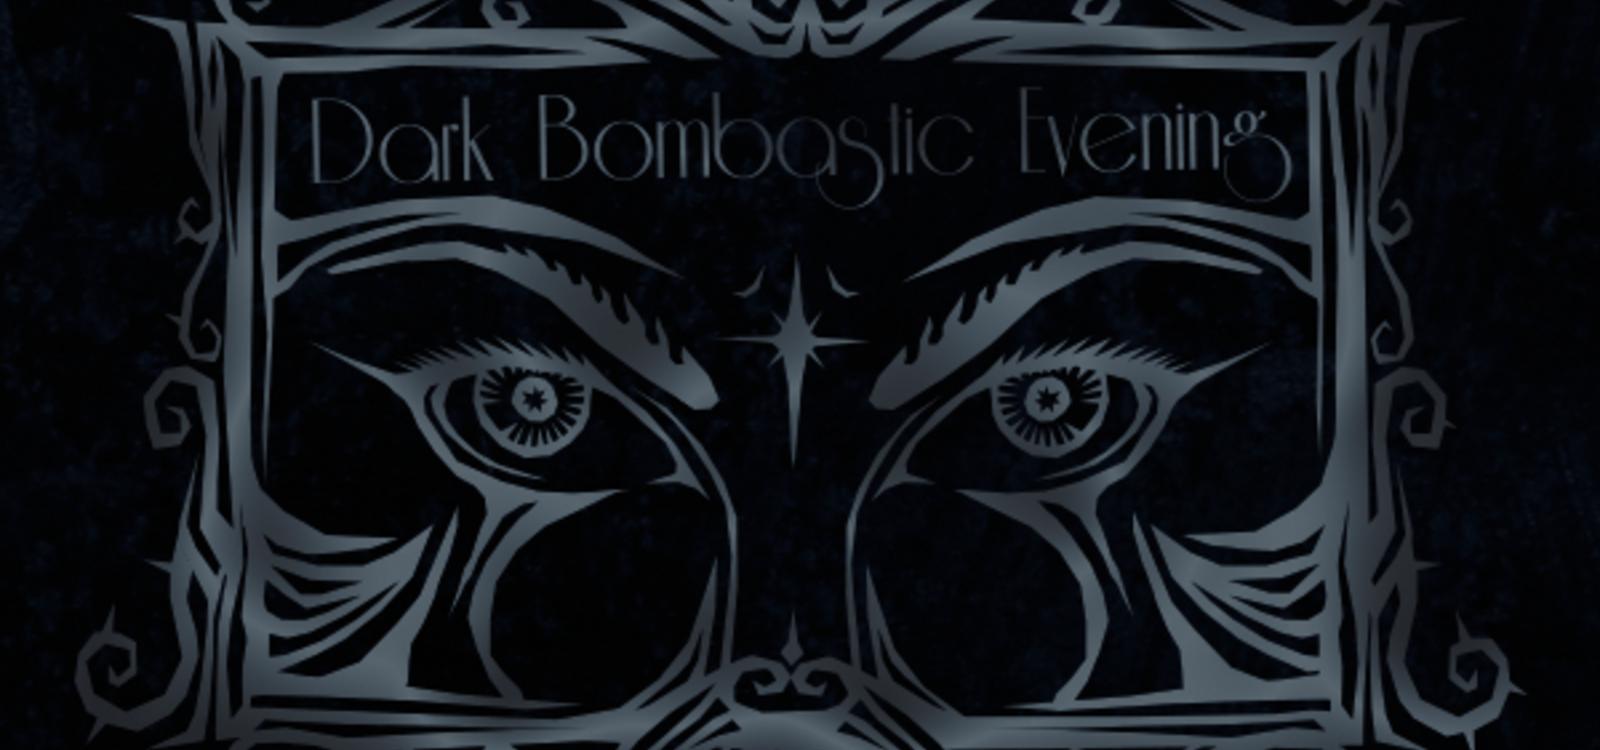 Dark Bombastic Evening